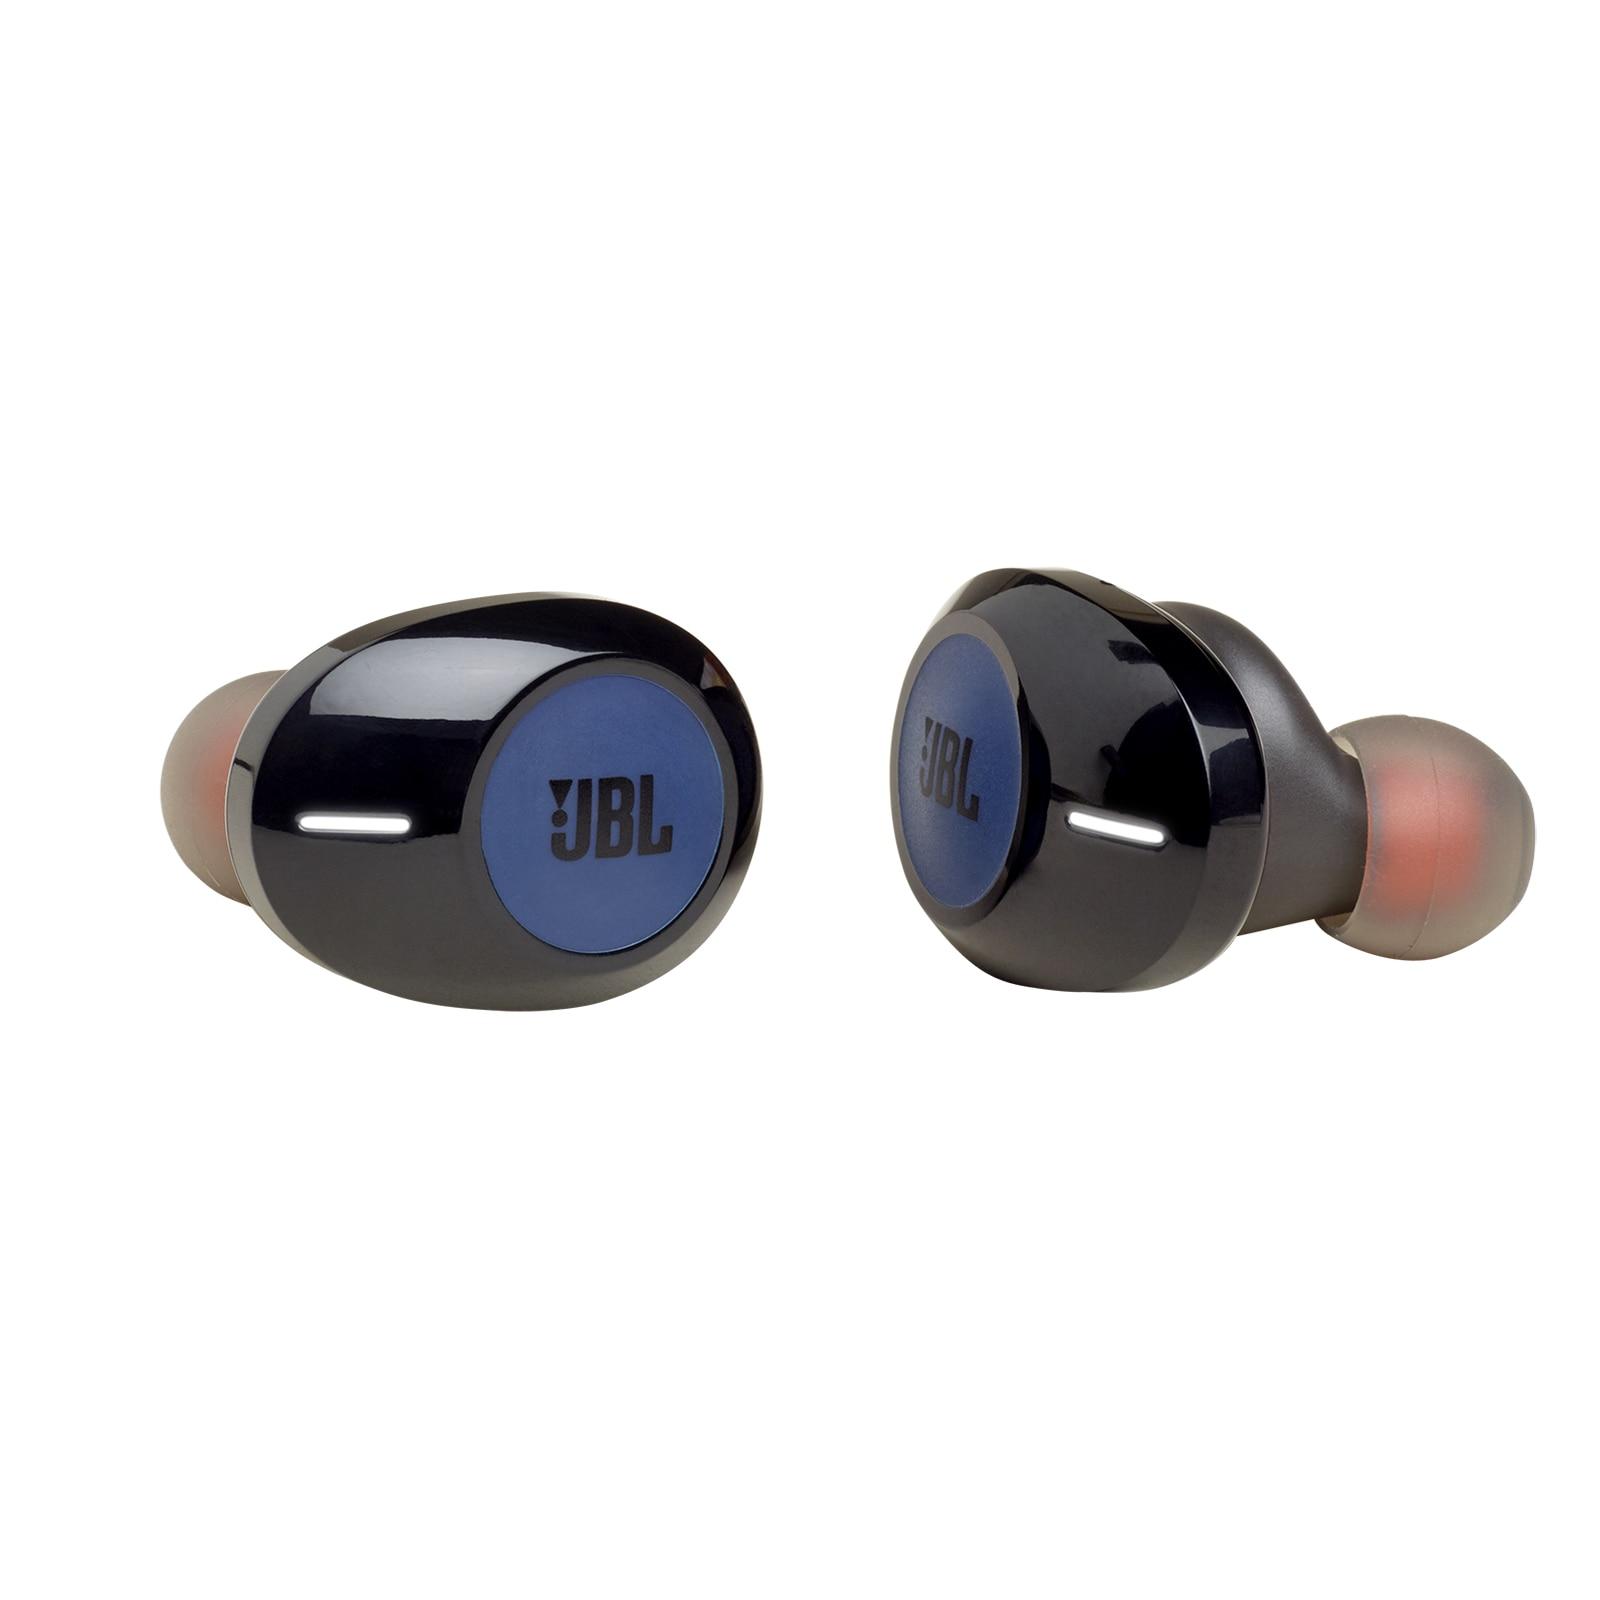 Fotografie Casti In-Ear True Wireless JBL Tune 120TWS, JBL Pure Bass Sound, Bluetooth Wireless, Hands-free Stereo Calls, 16h playback, Albastru